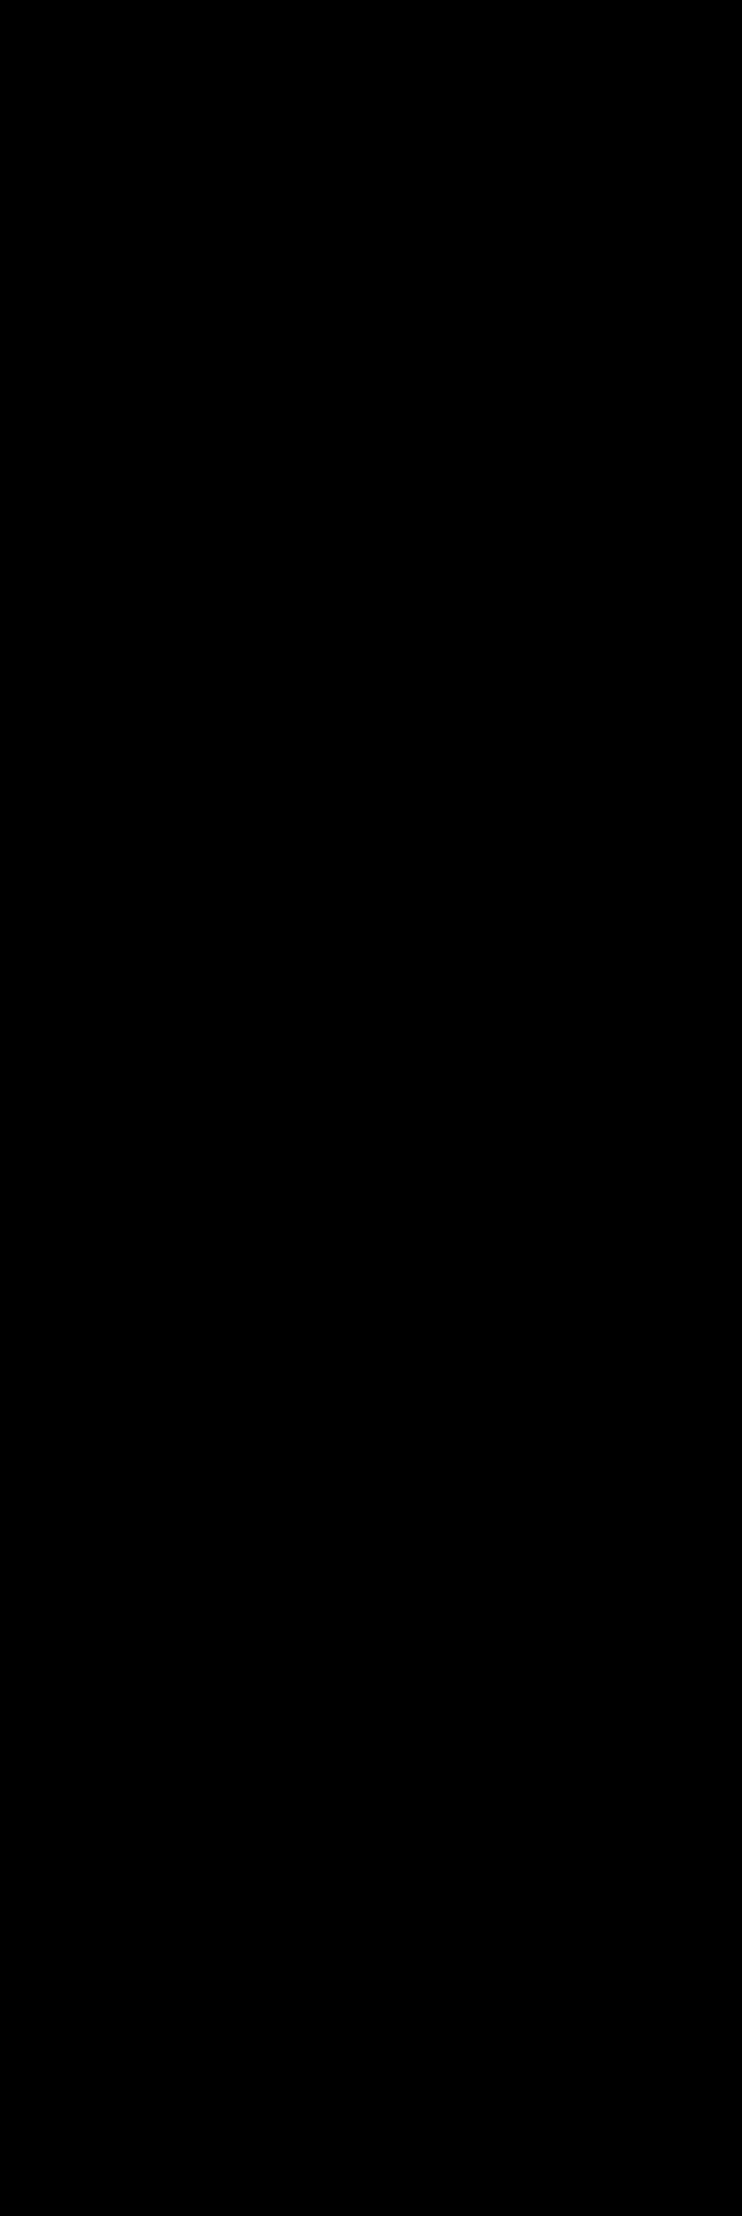 guitar silhouette at getdrawings com free for personal use guitar rh getdrawings com